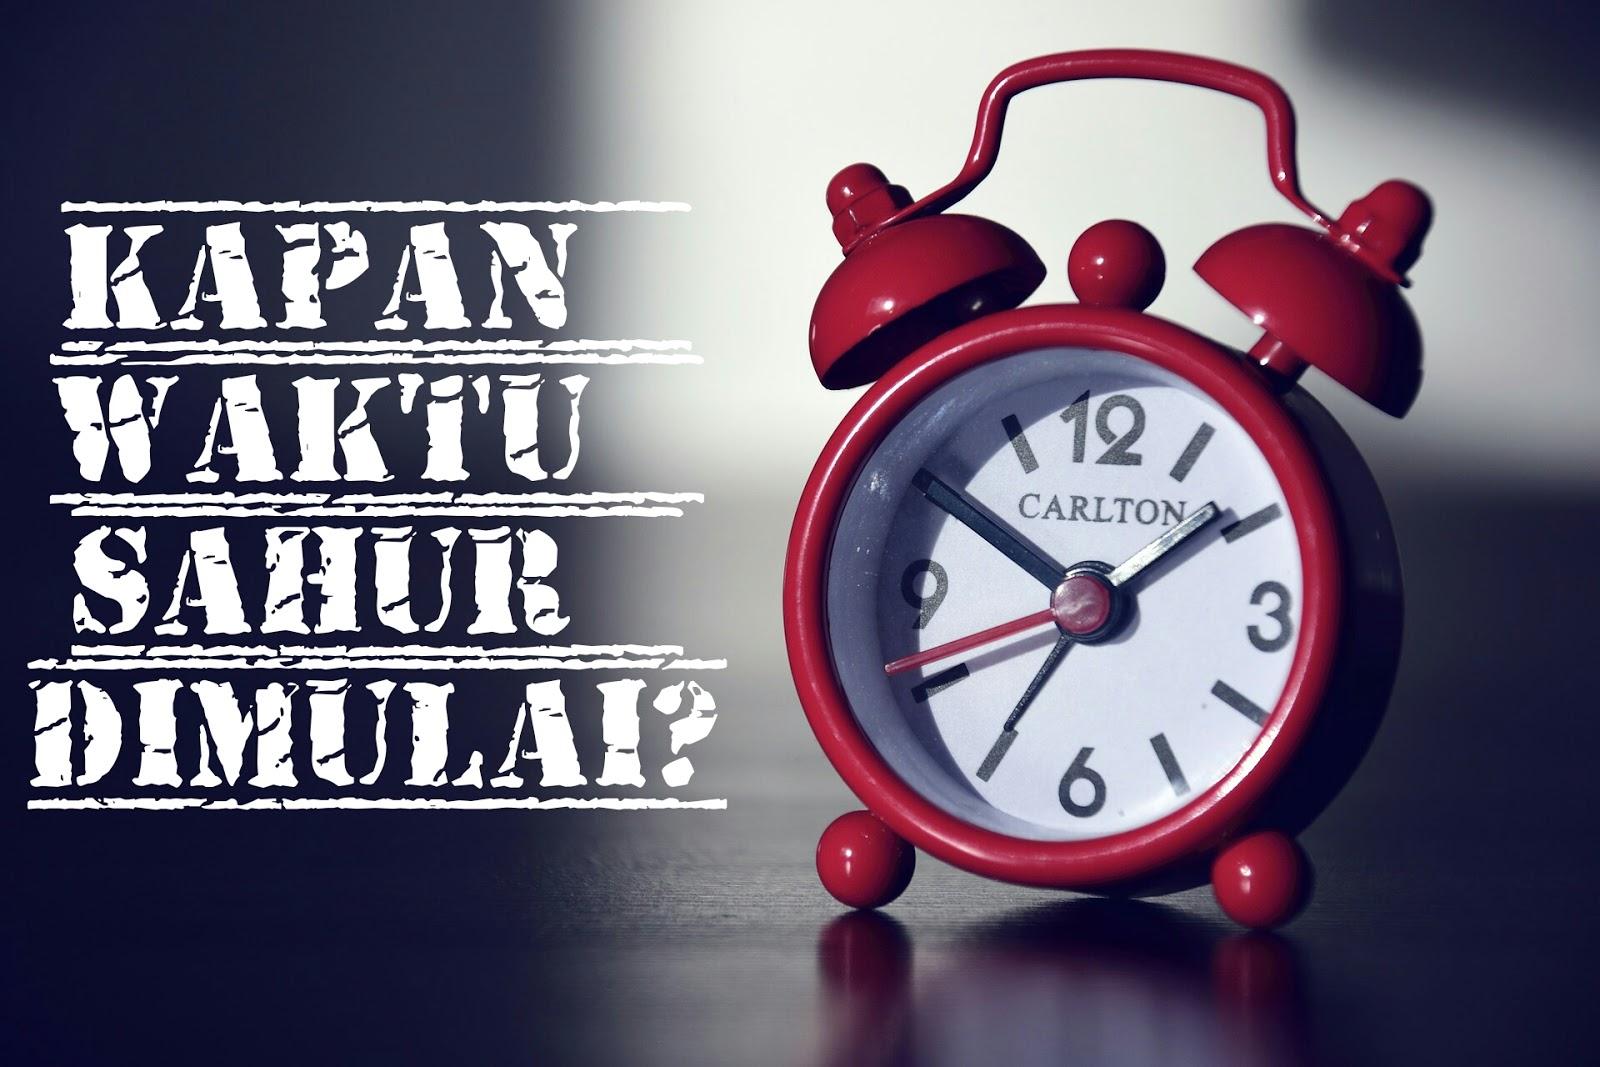 Kapan Batas Waktu Sahur Dimulai dan Berakhir?